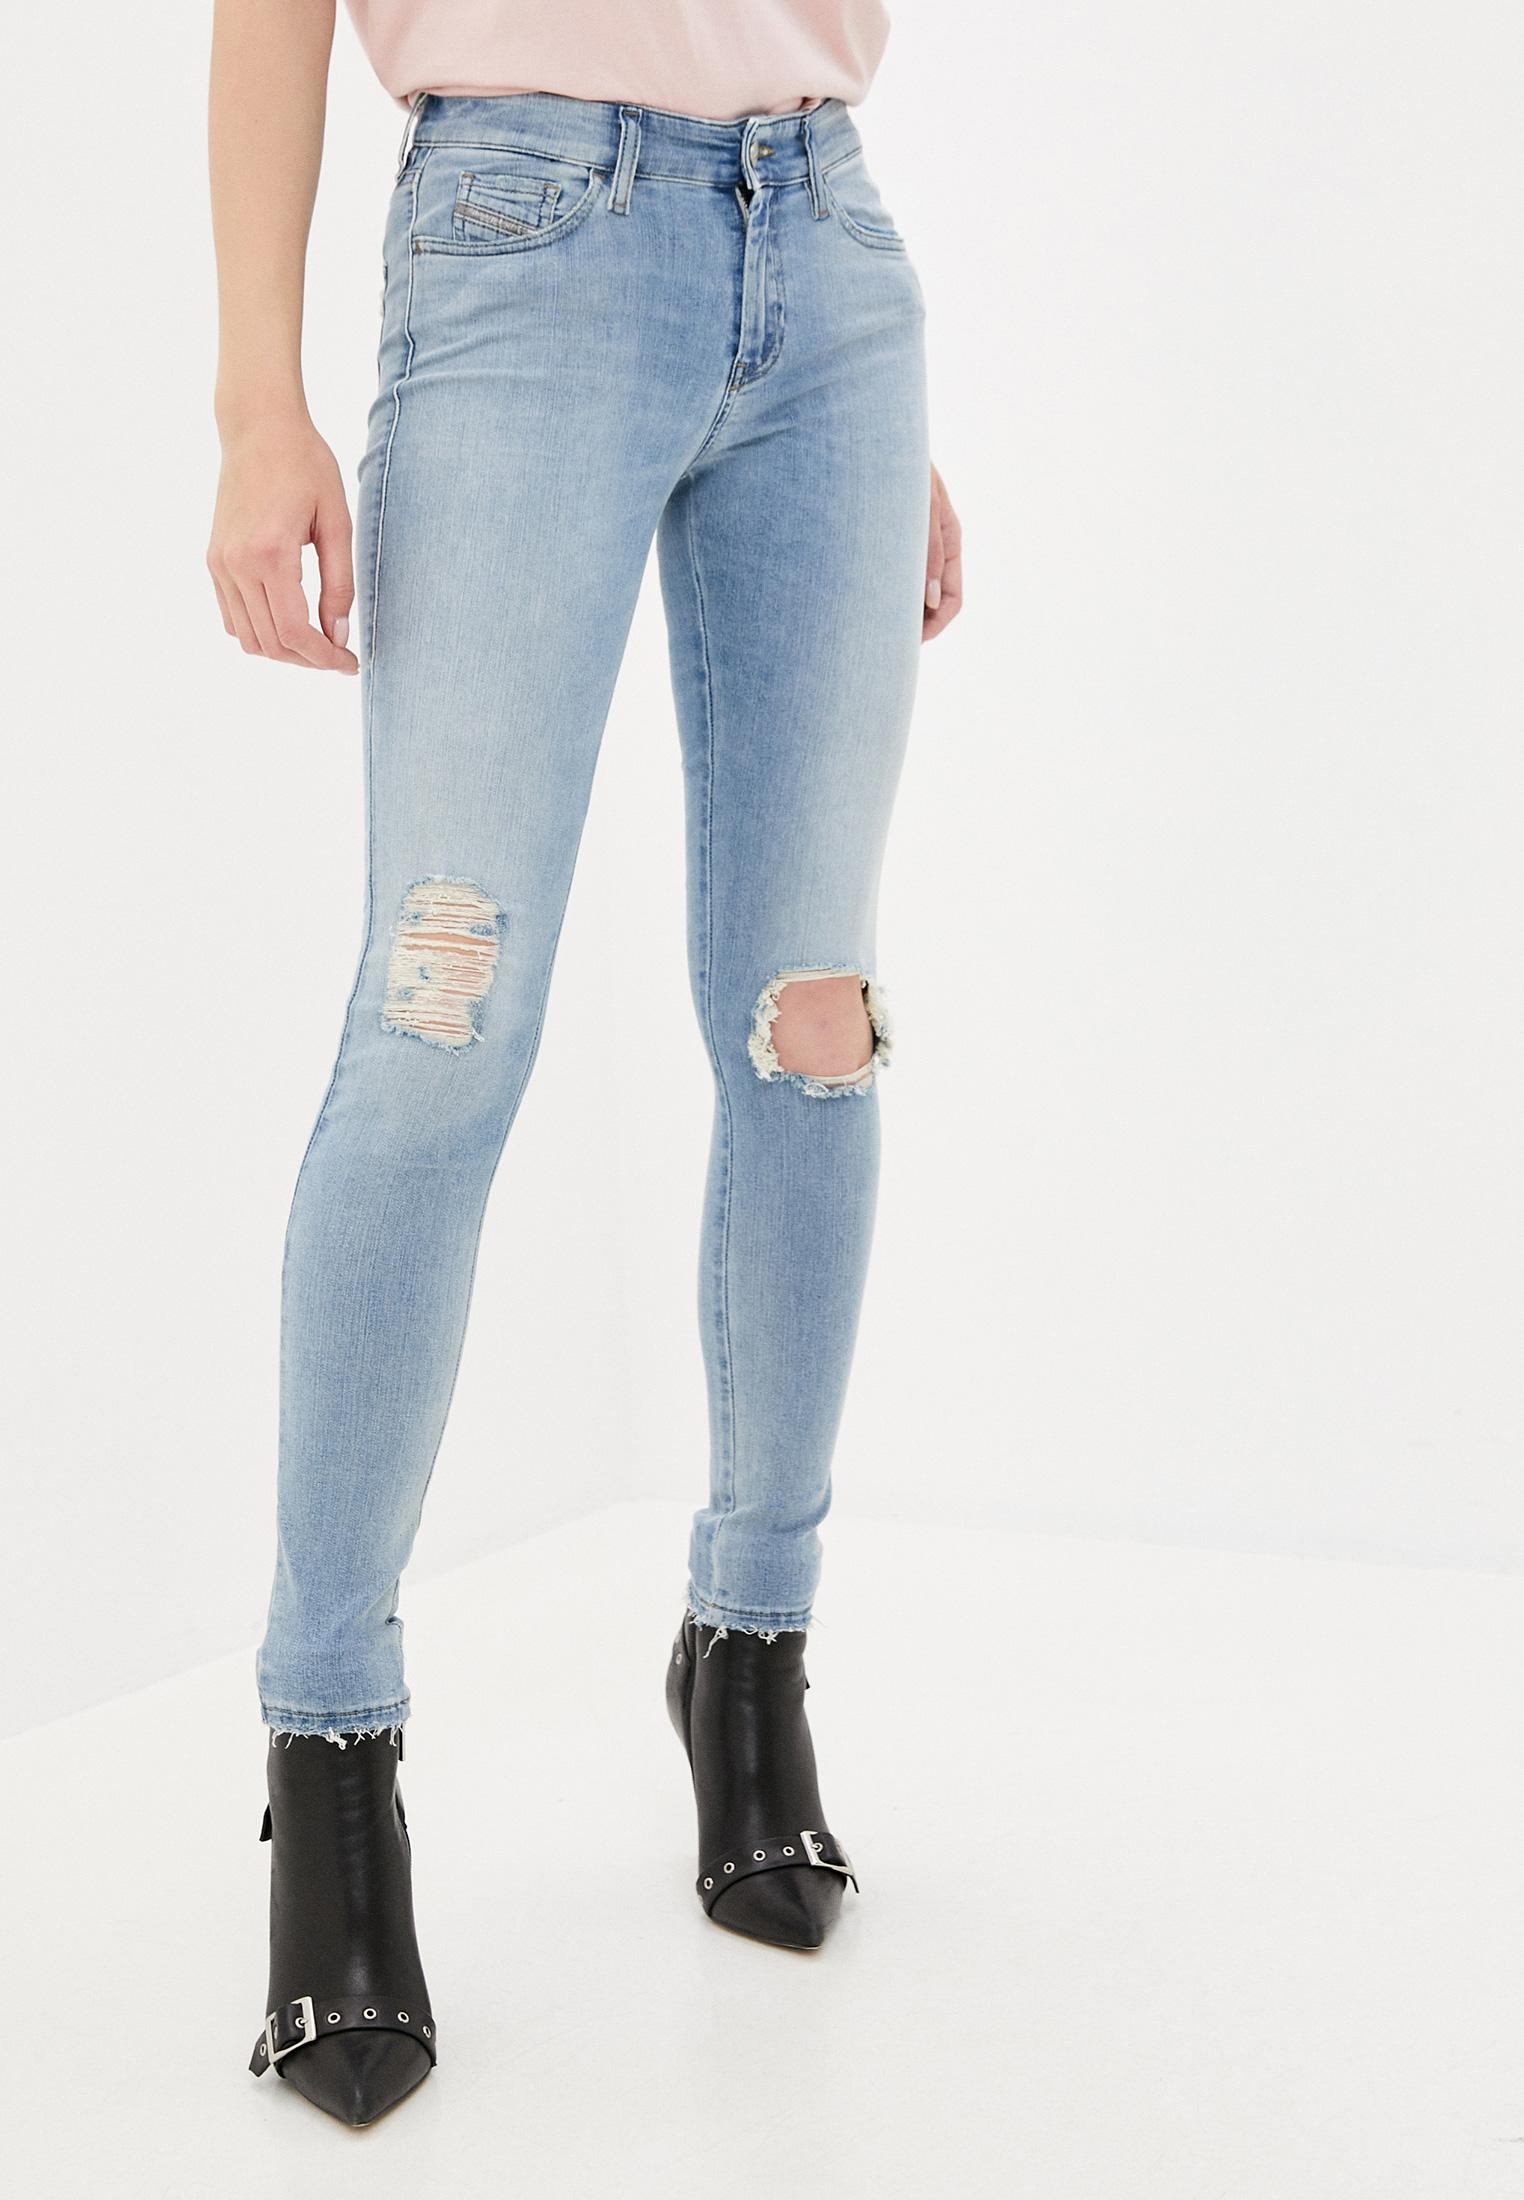 Зауженные джинсы Diesel (Дизель) 00SXJN084MT